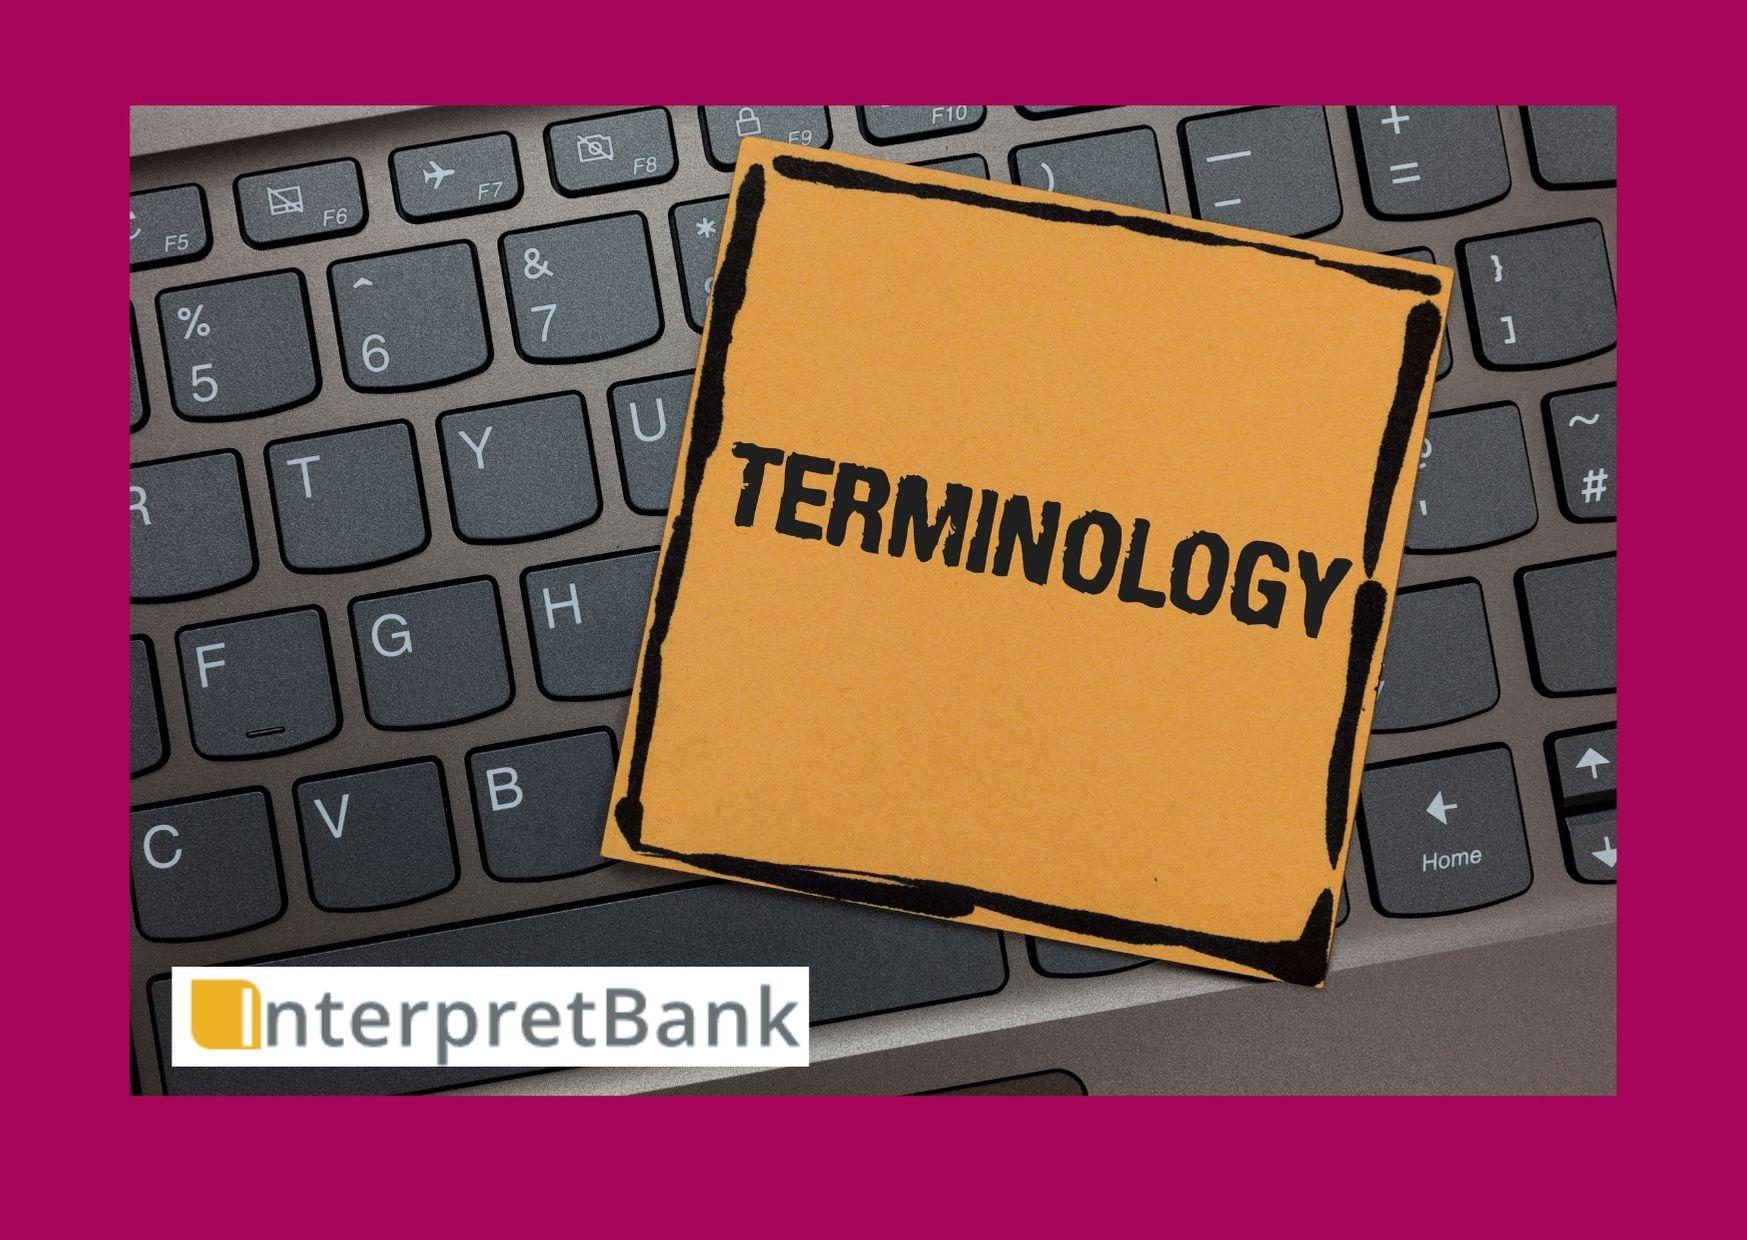 InterpretBank upsell image